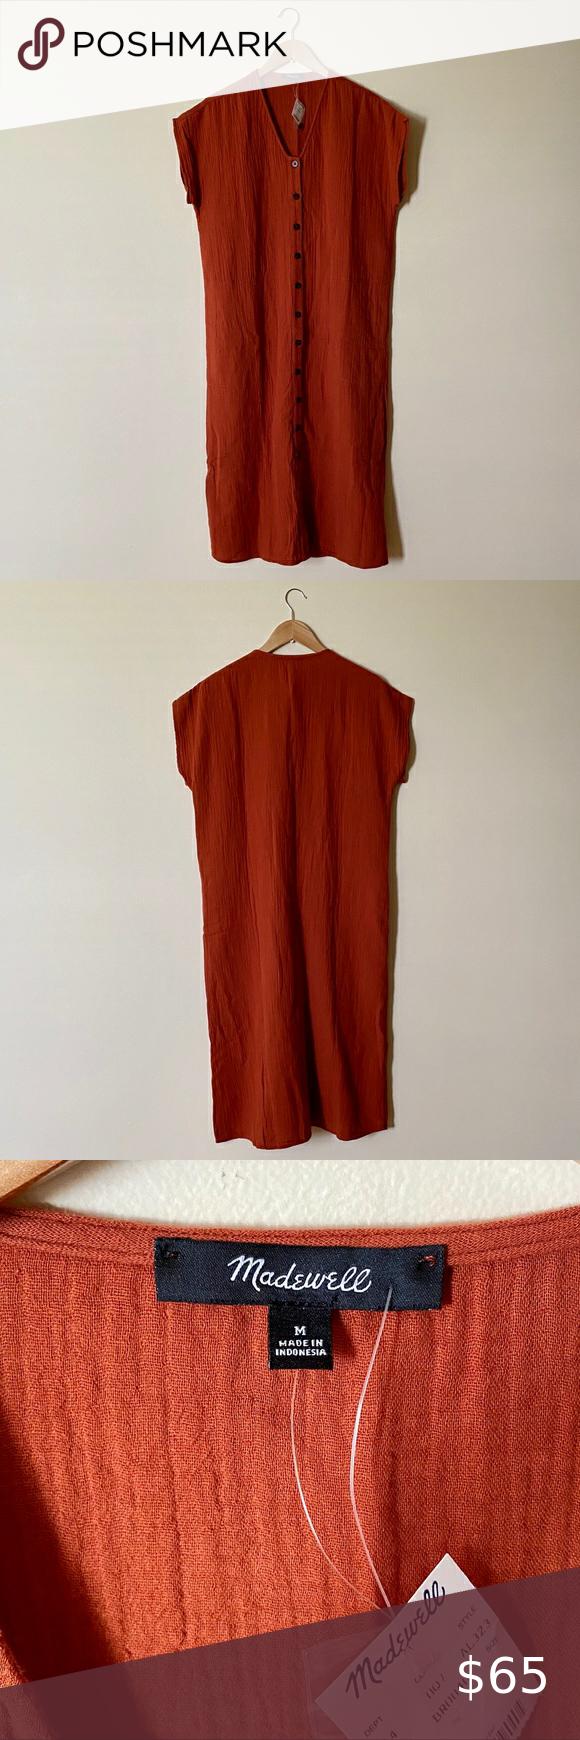 Madewell Gauze Easy Midi Dress Striped Casual Dresses Madewell Shirt Dress Midi Dress [ 1740 x 580 Pixel ]